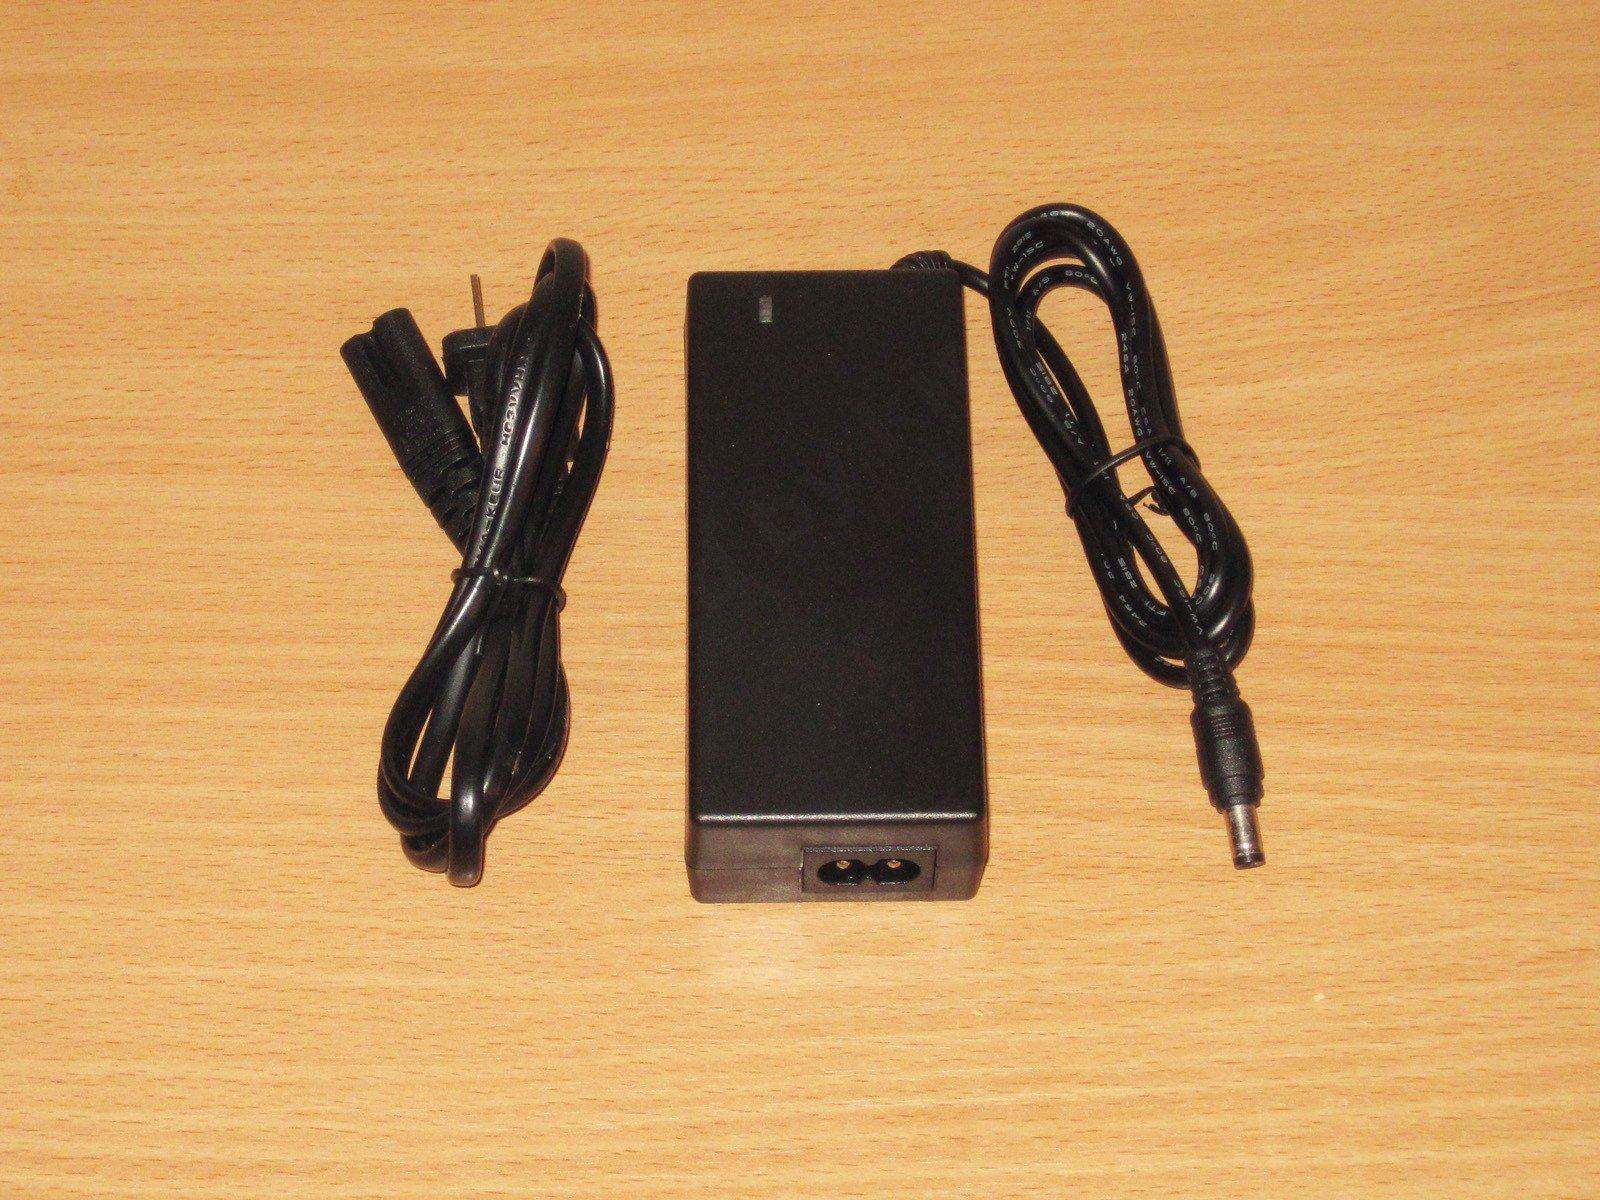 зарядное устройство зубр 14 4 схема